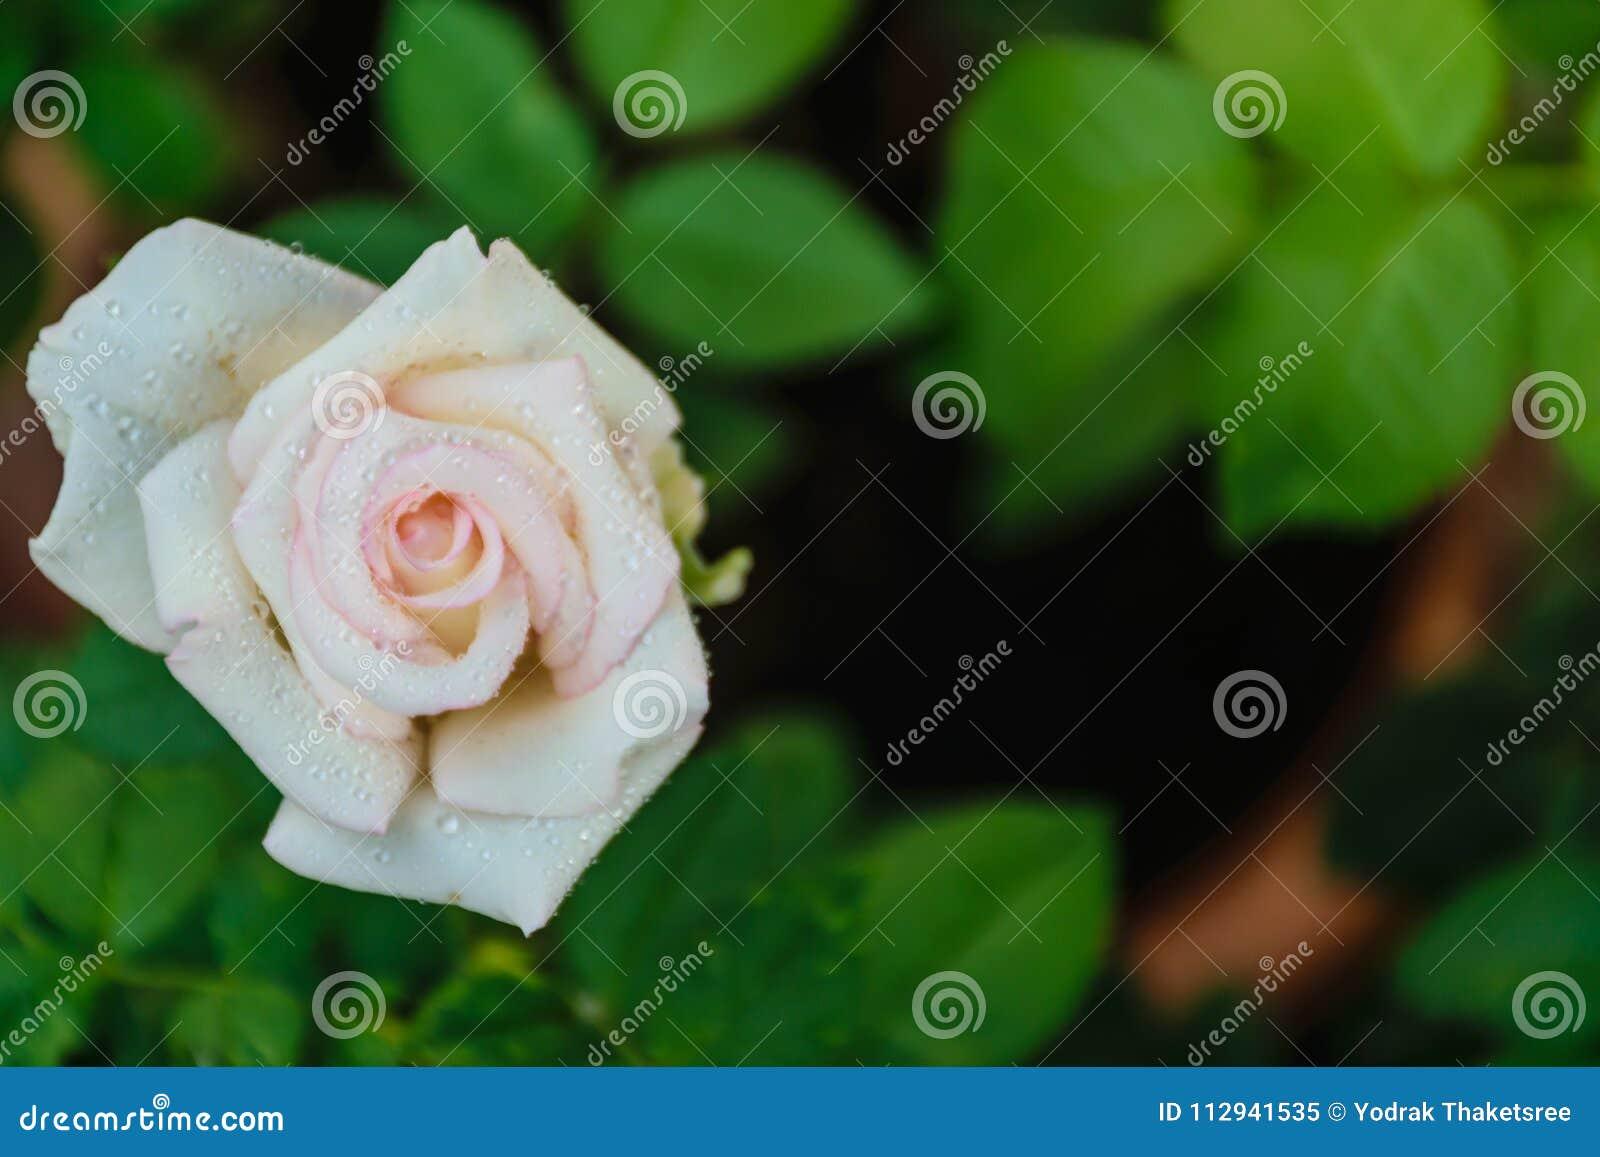 Blooming White Rose Petal Stock Image Image Of Flowers 112941535